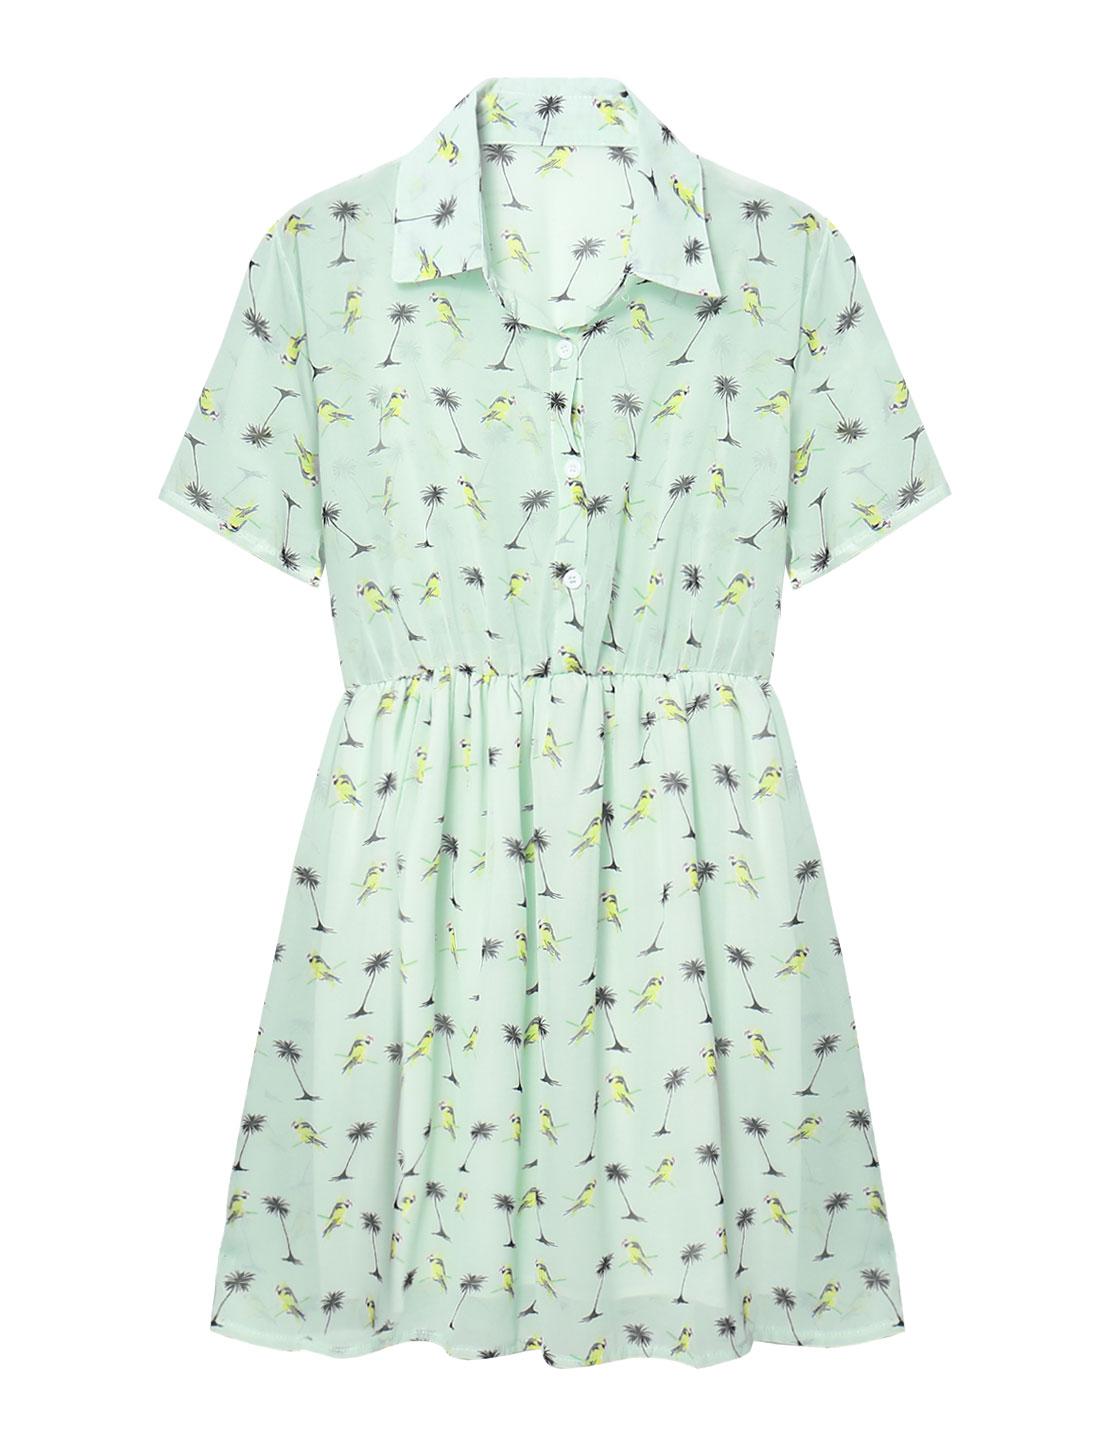 Women Parrots Trees Prints Sheer Chiffon Shirt Dress Green S